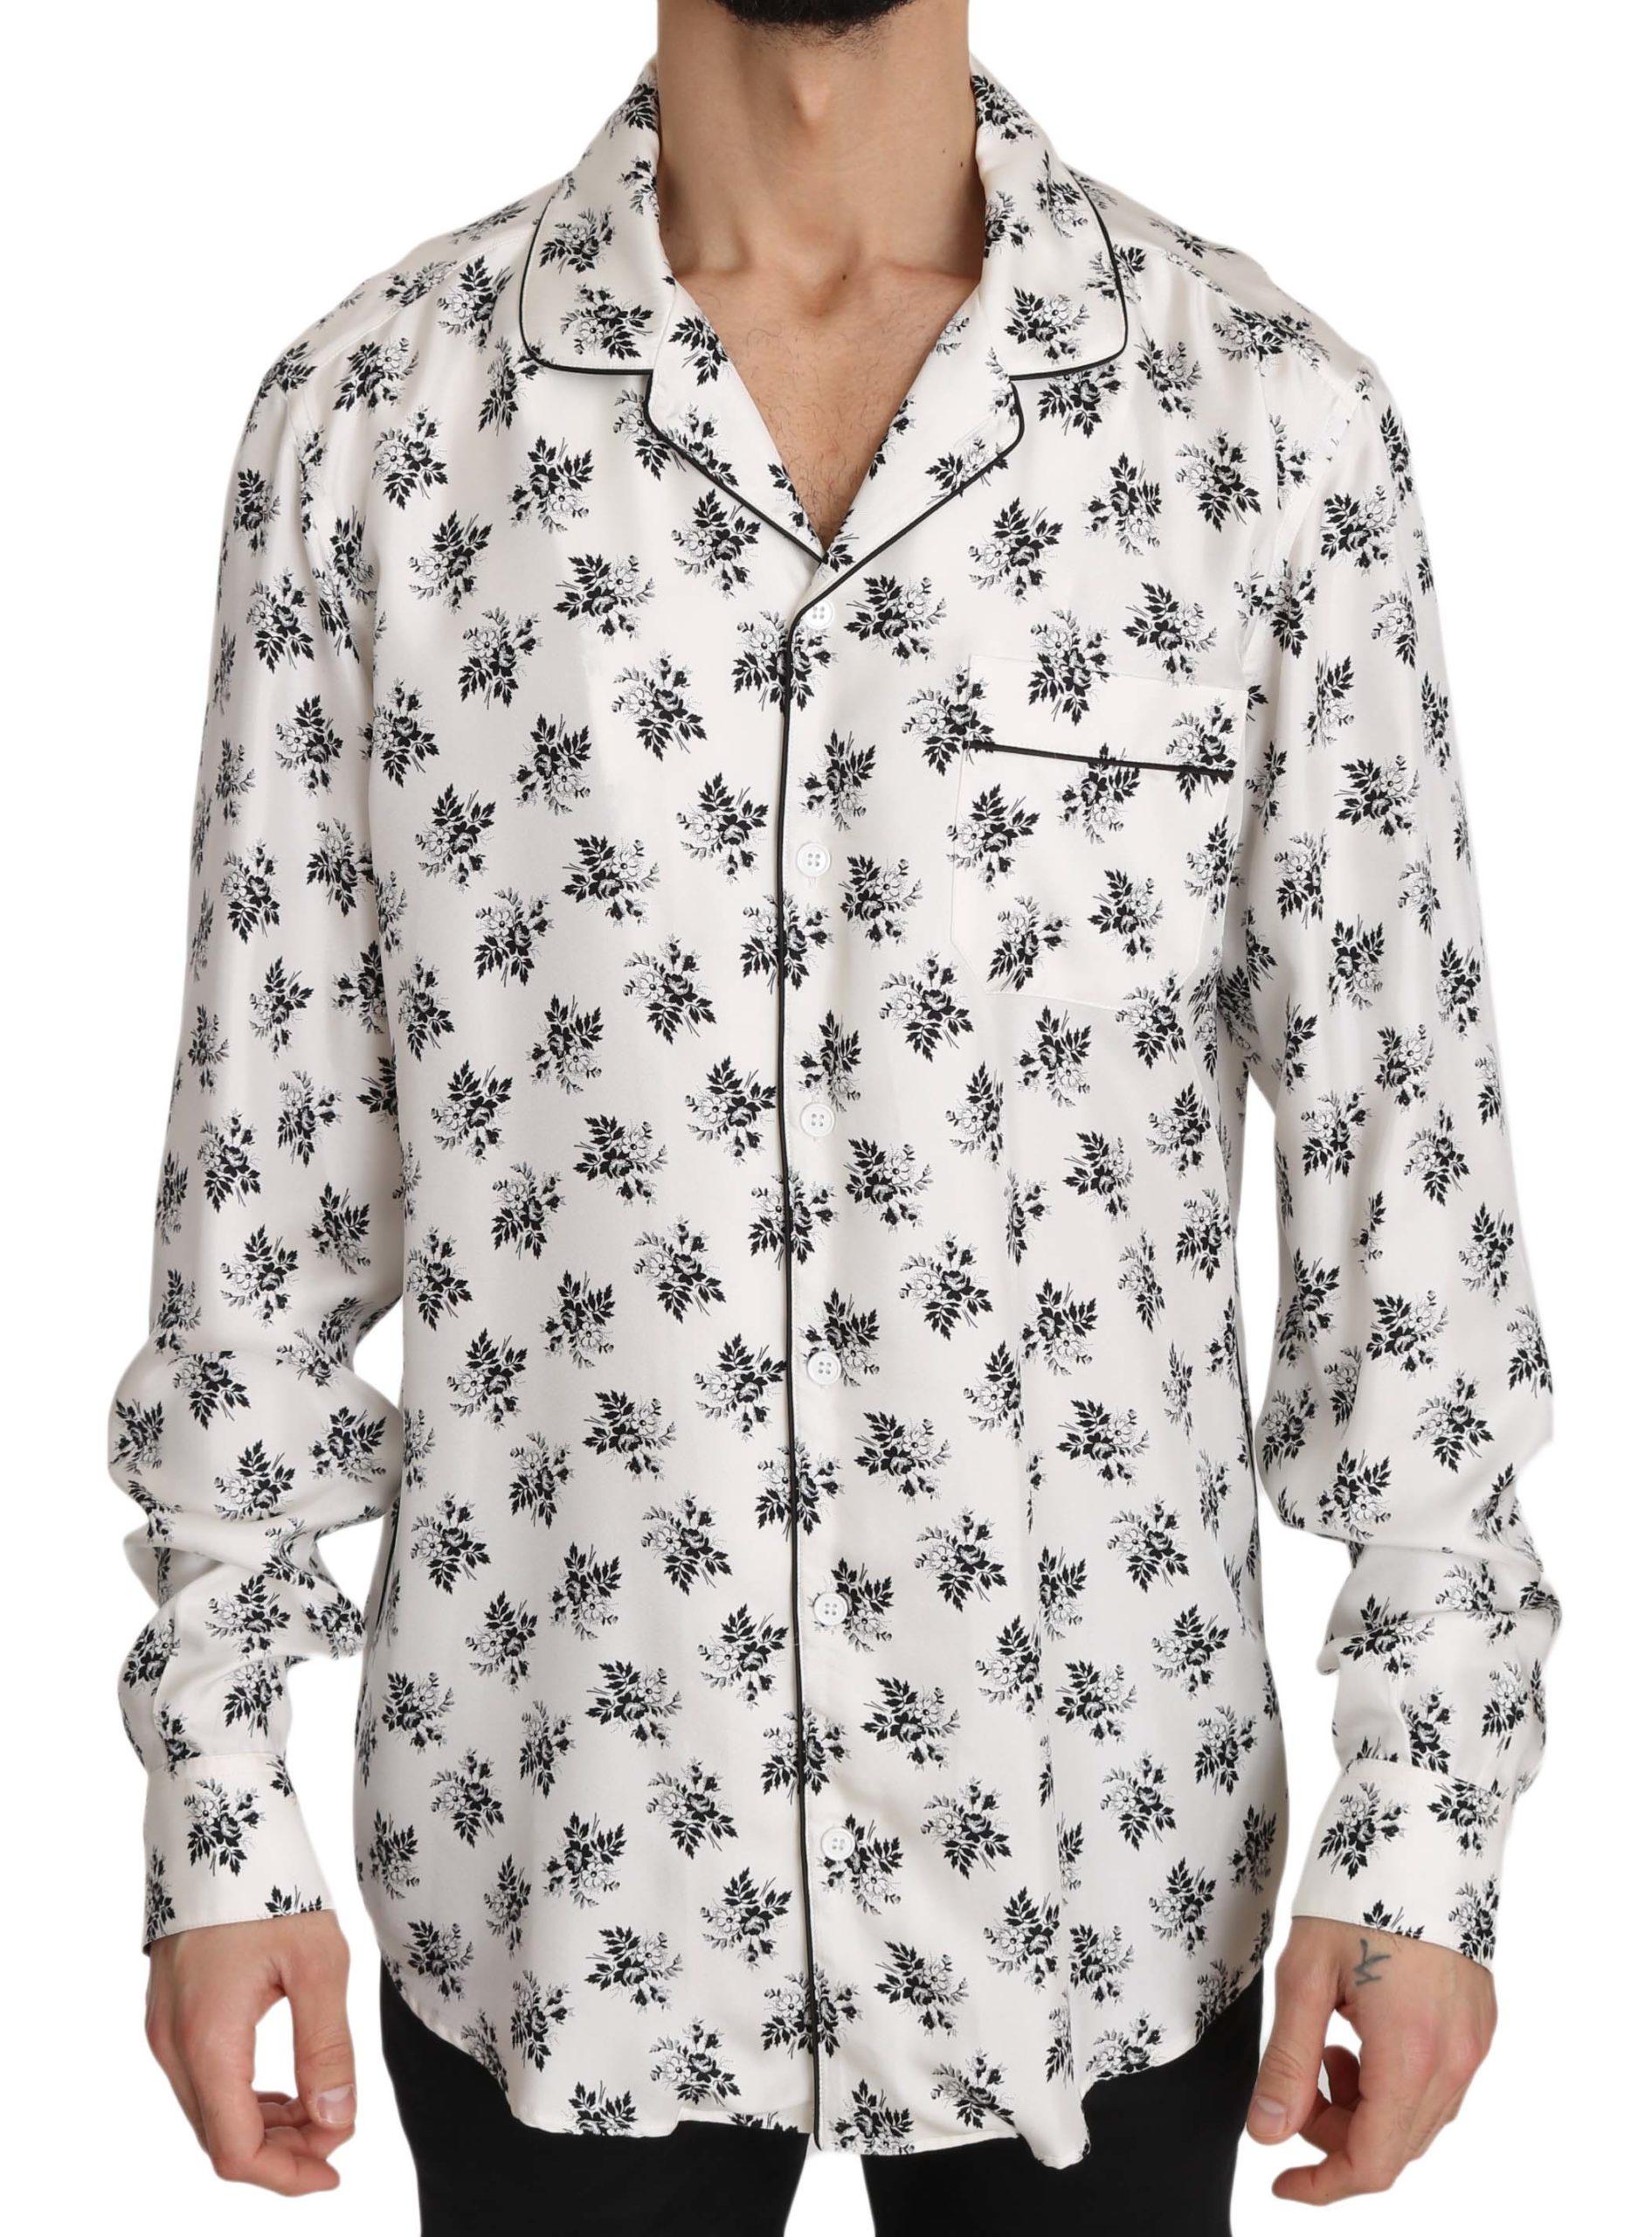 Dolce & Gabbana Men's SILK Floral Print Sleepwear Shirt White/Black TSH3364 - IT4| s